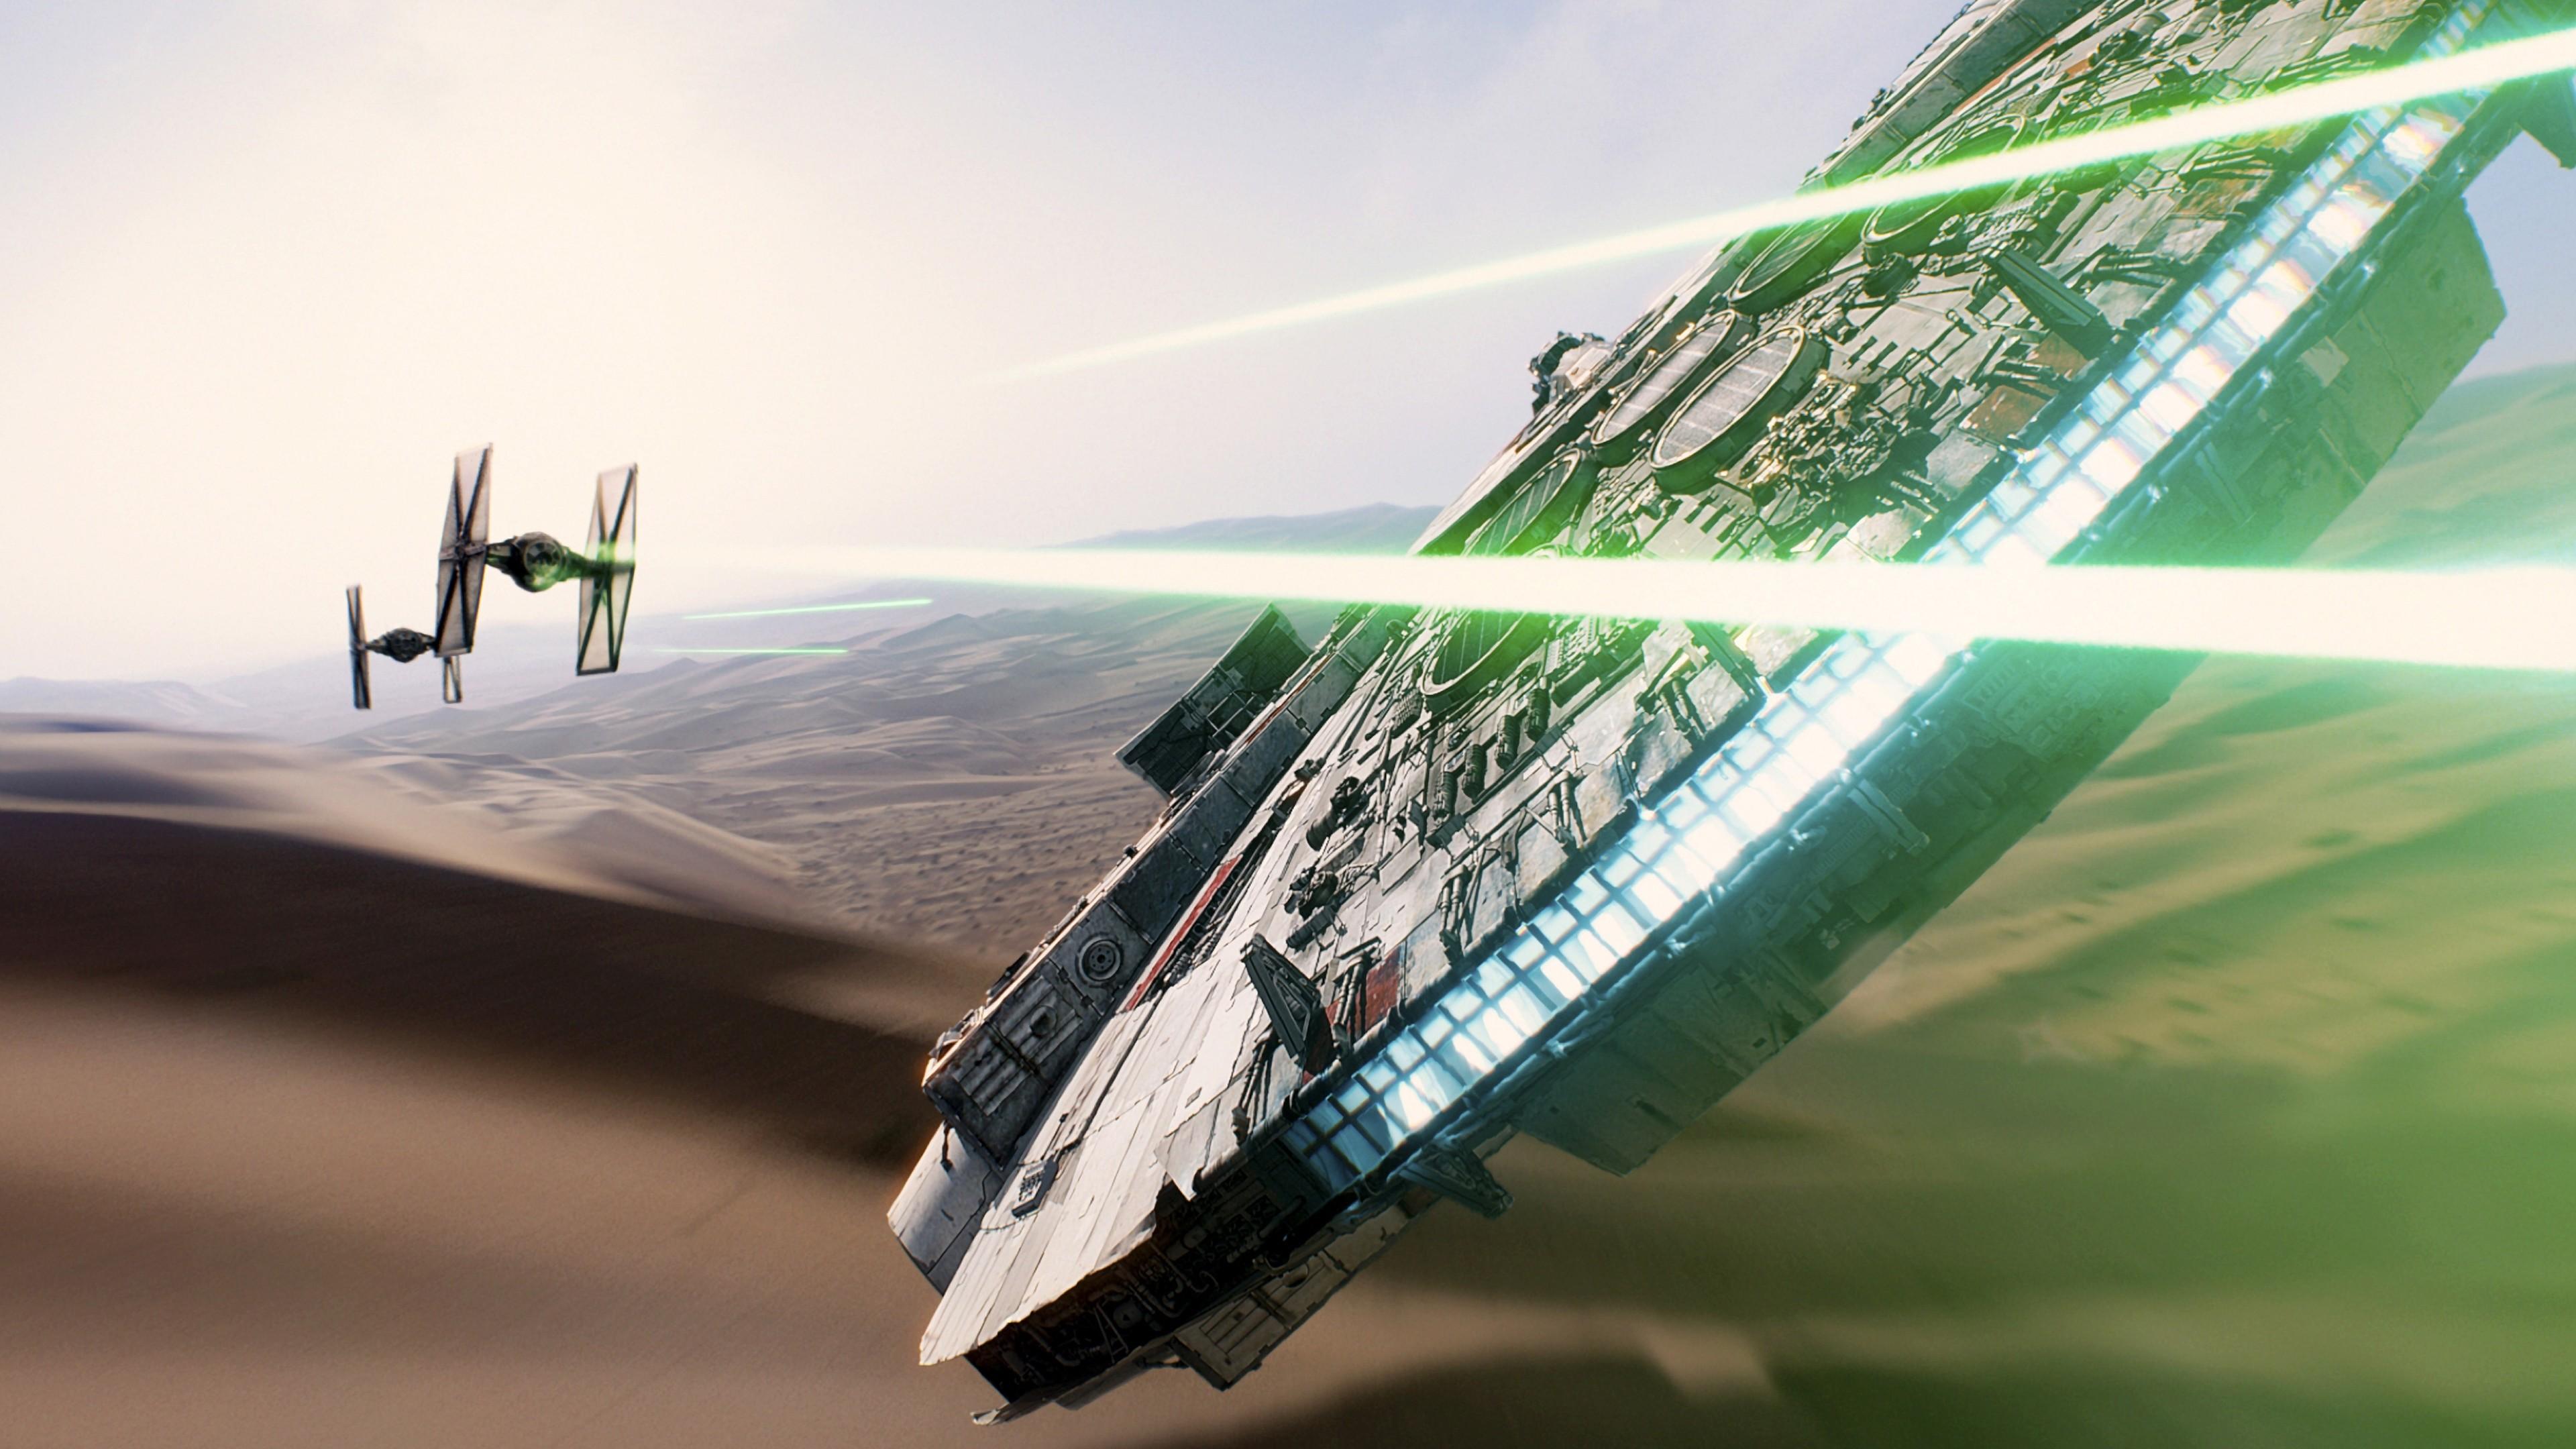 Star Wars Wallpaper Dump – 1080p – https://imgur.com/gallery/arXmv Star Wars  Phone Wallpaper Dump – 1080×1920 – https://imgur.com/gallery/I7Sll …